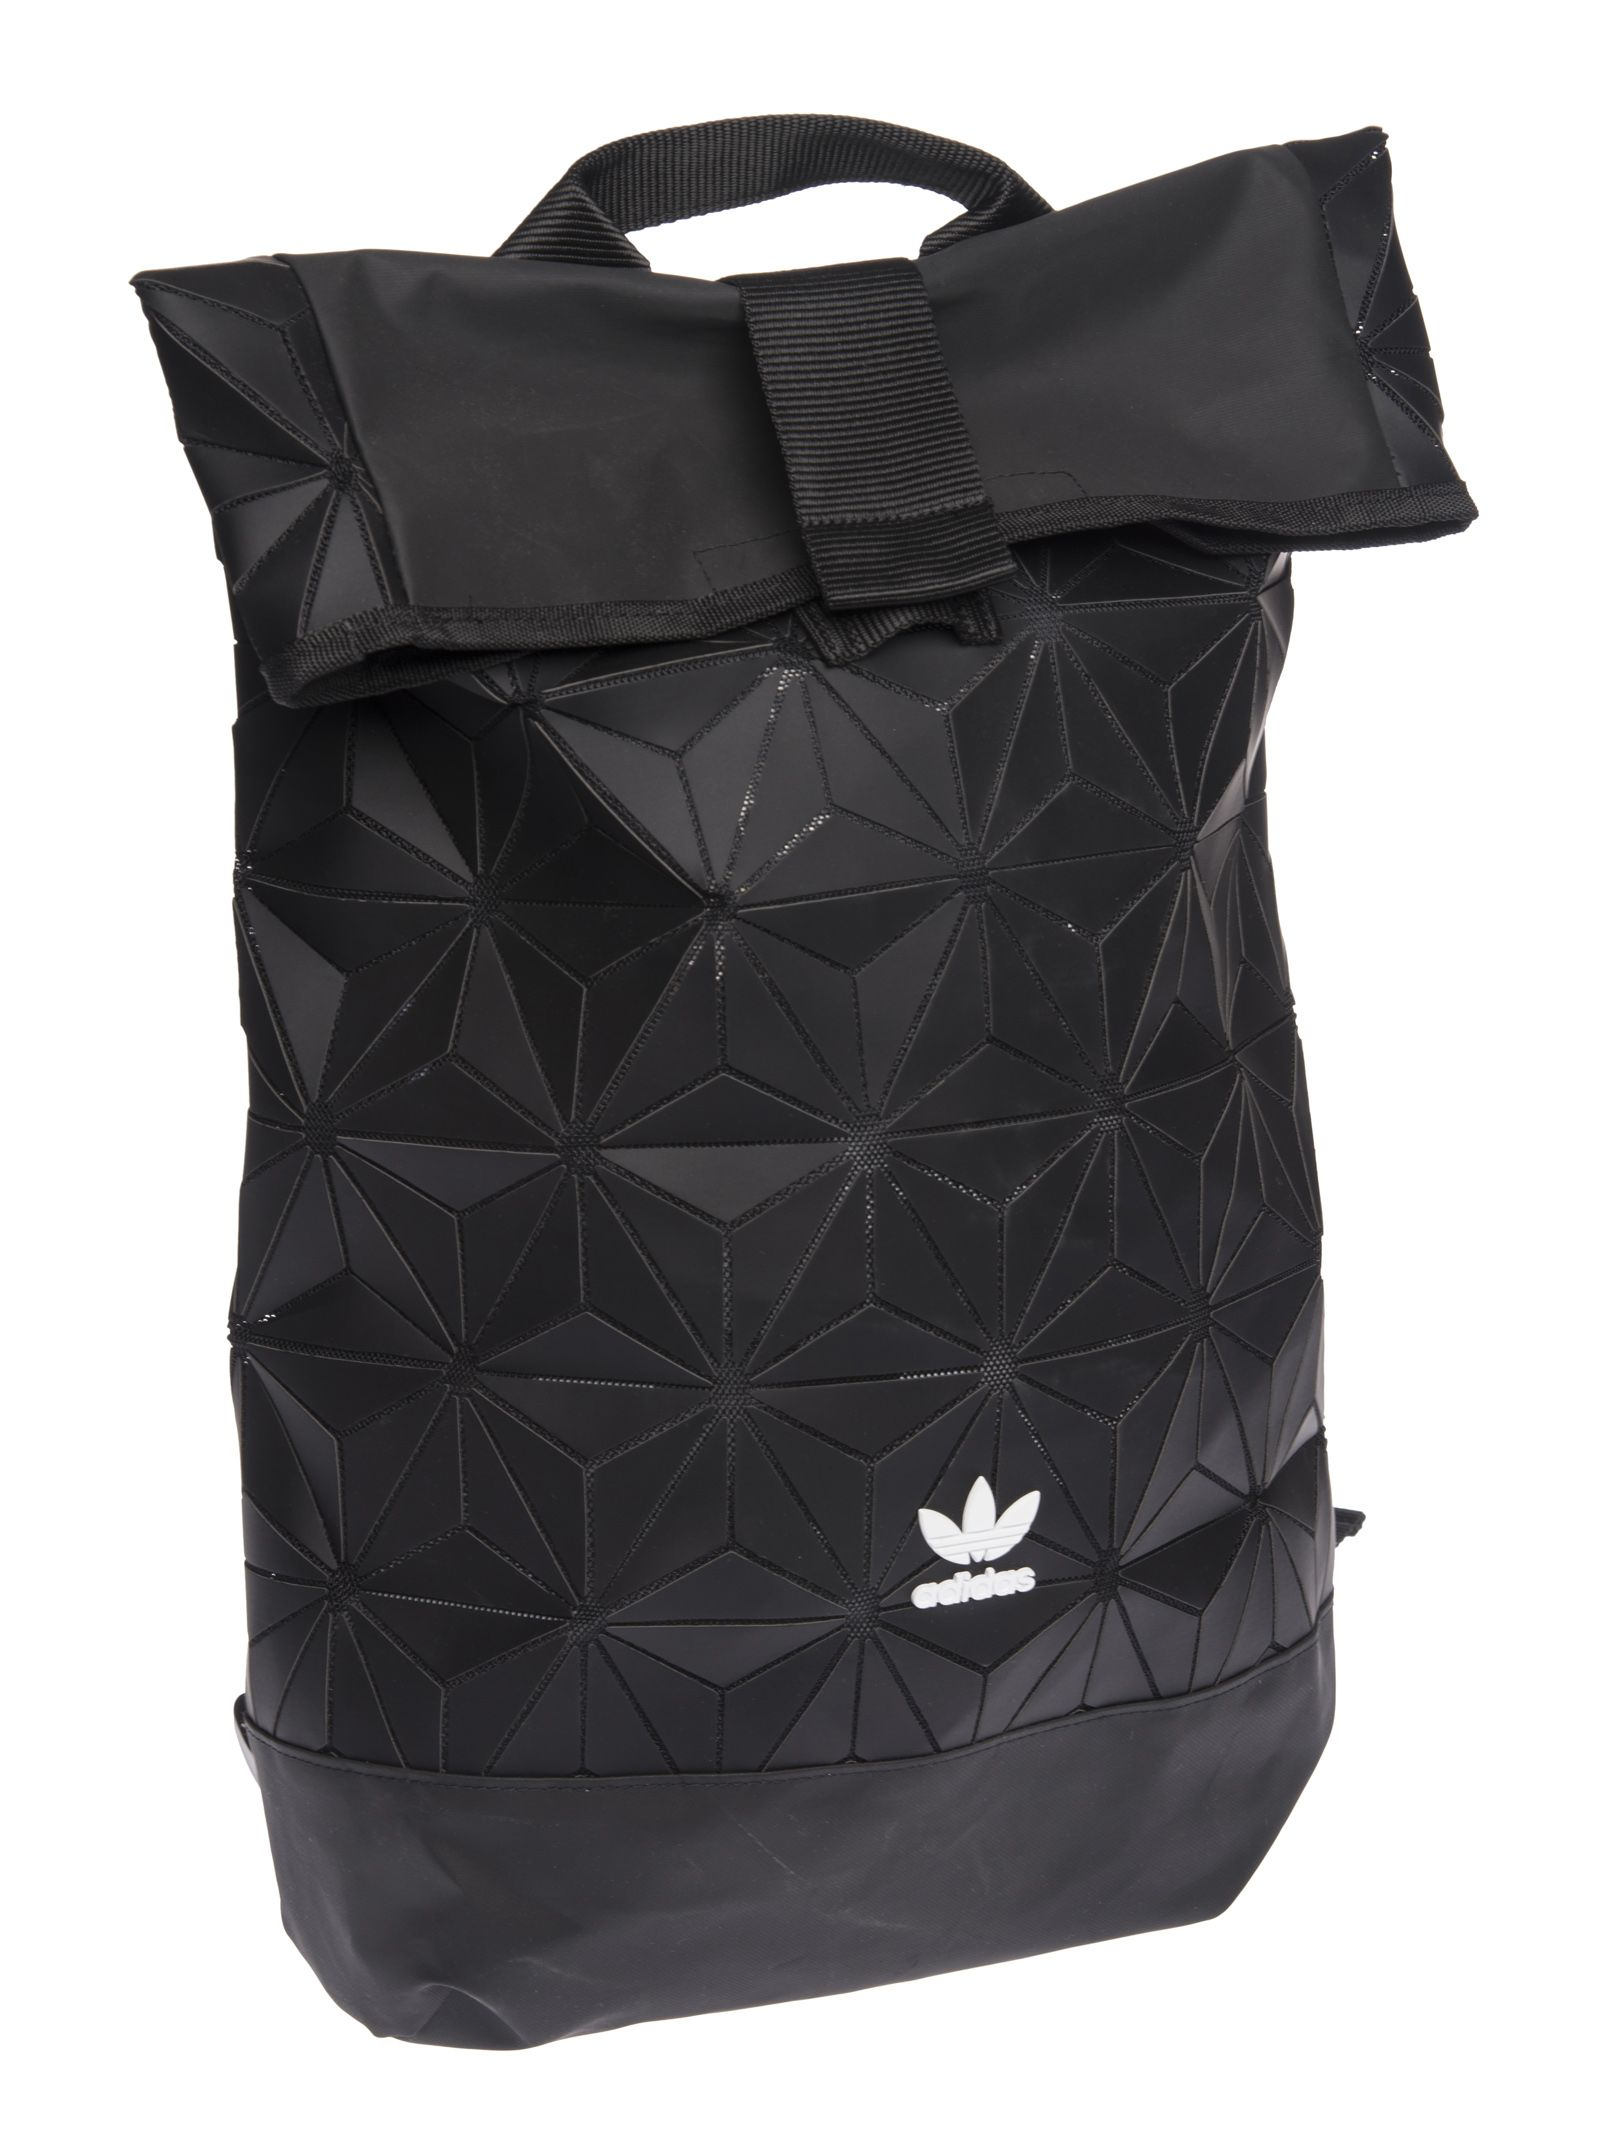 Adidas Originals Urban Backpack Black 4114447 Italist